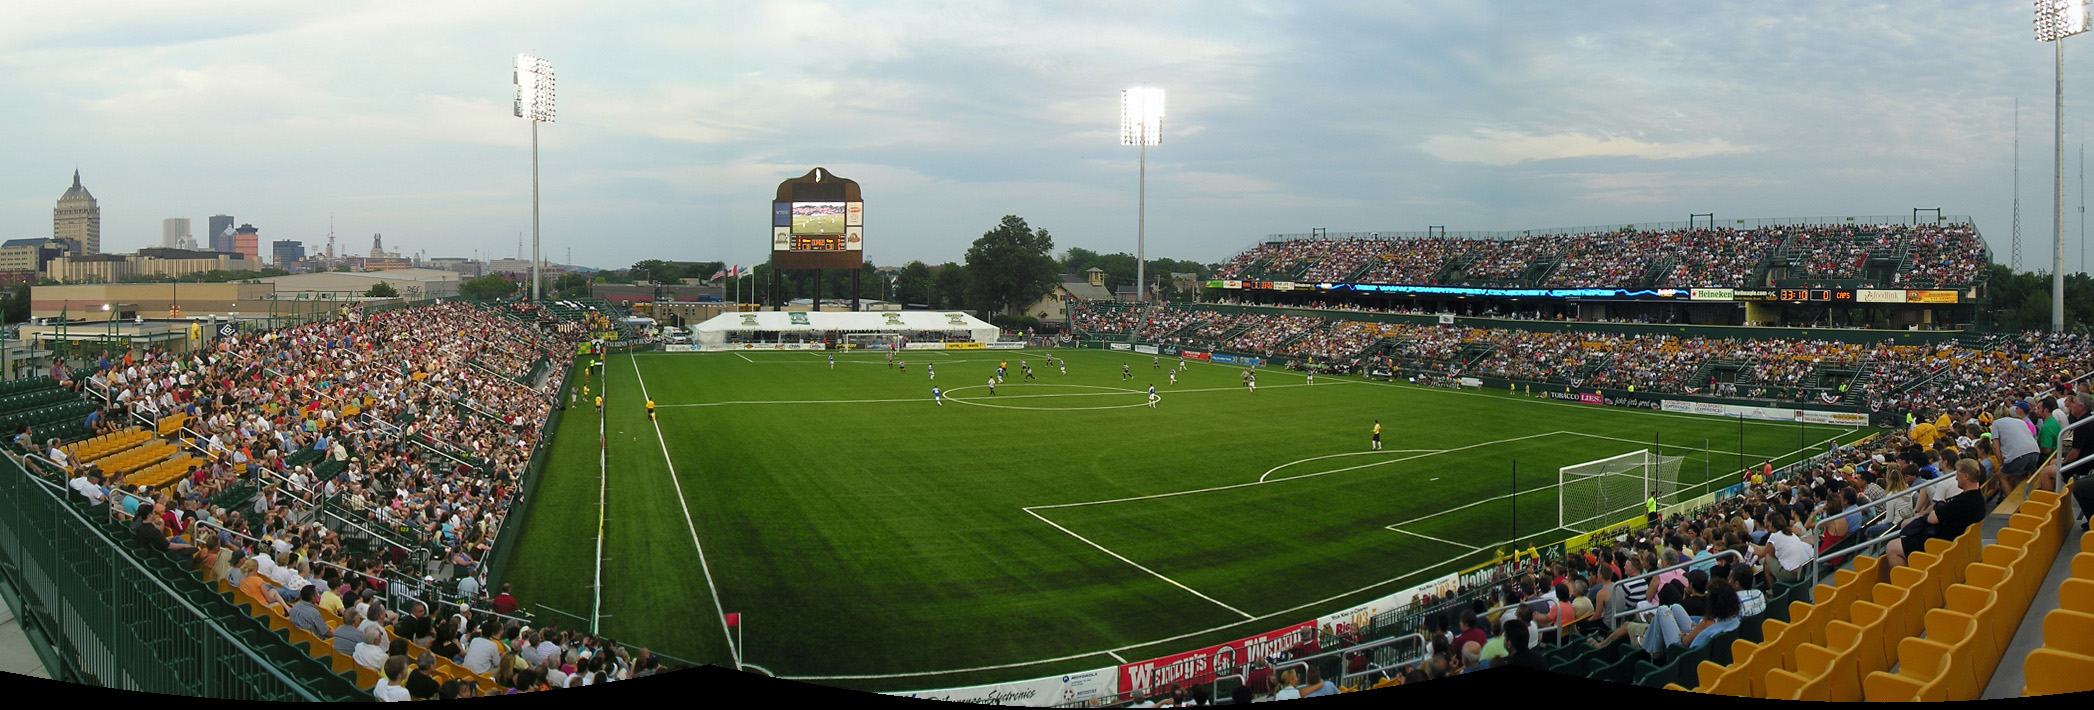 Former Marina Auto Stadium, now Sahlen's Stadium, Rochester, N.Y.